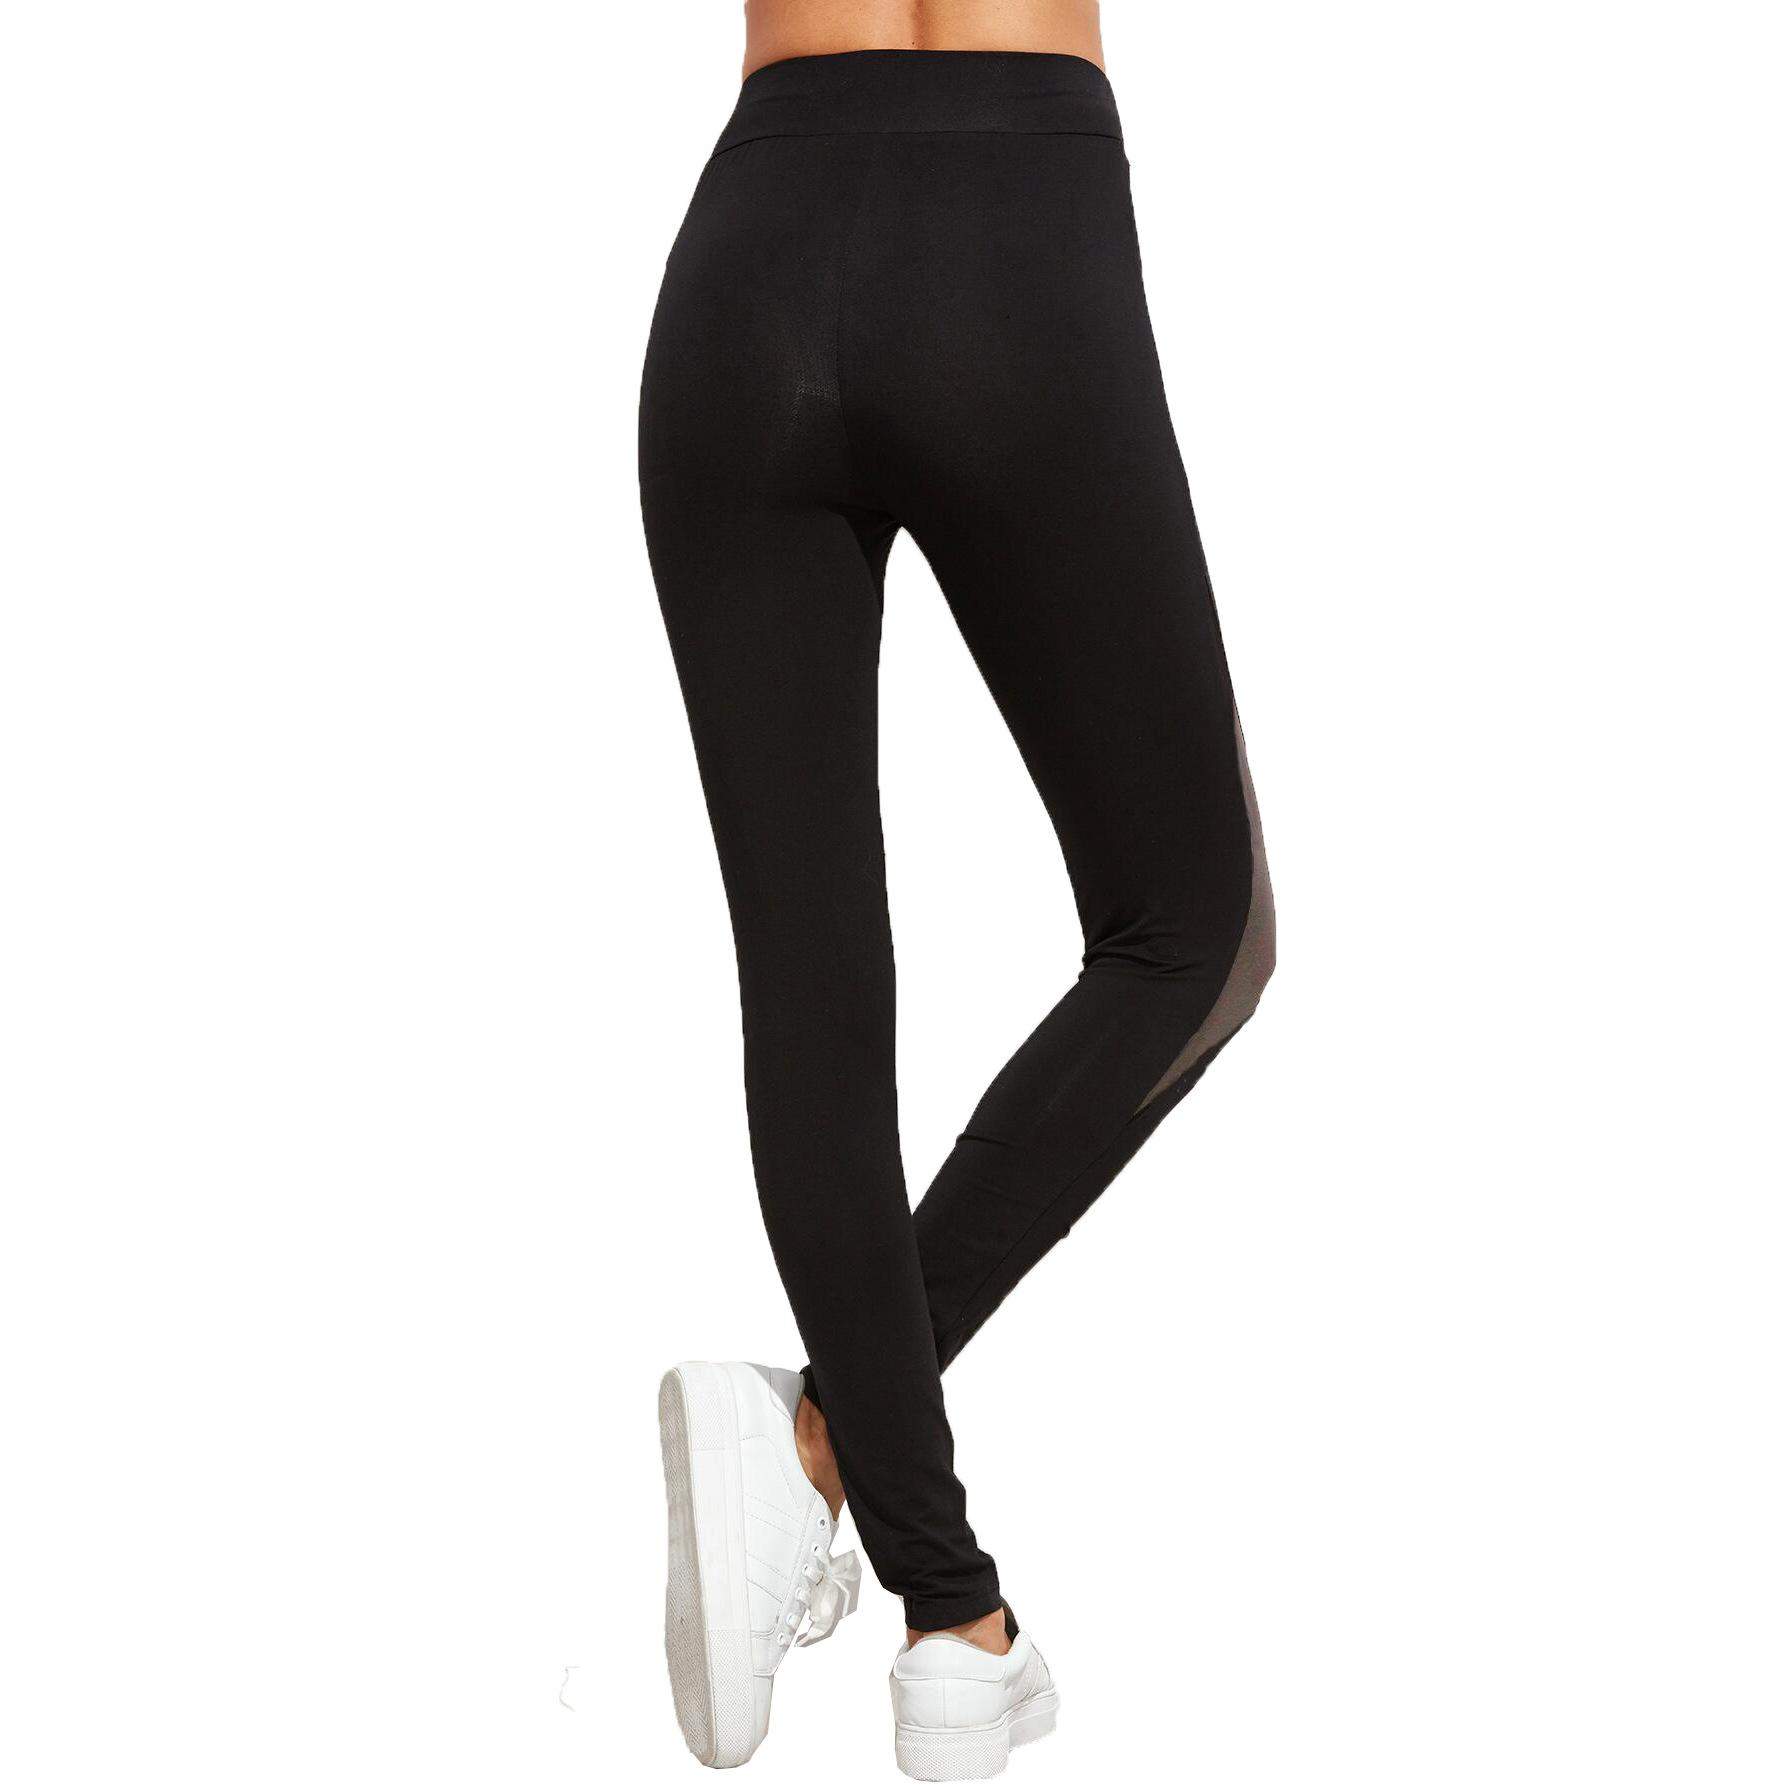 714c4978c09170 Sports Yoga Trousers High Waist Pants Europe And America Cross ...